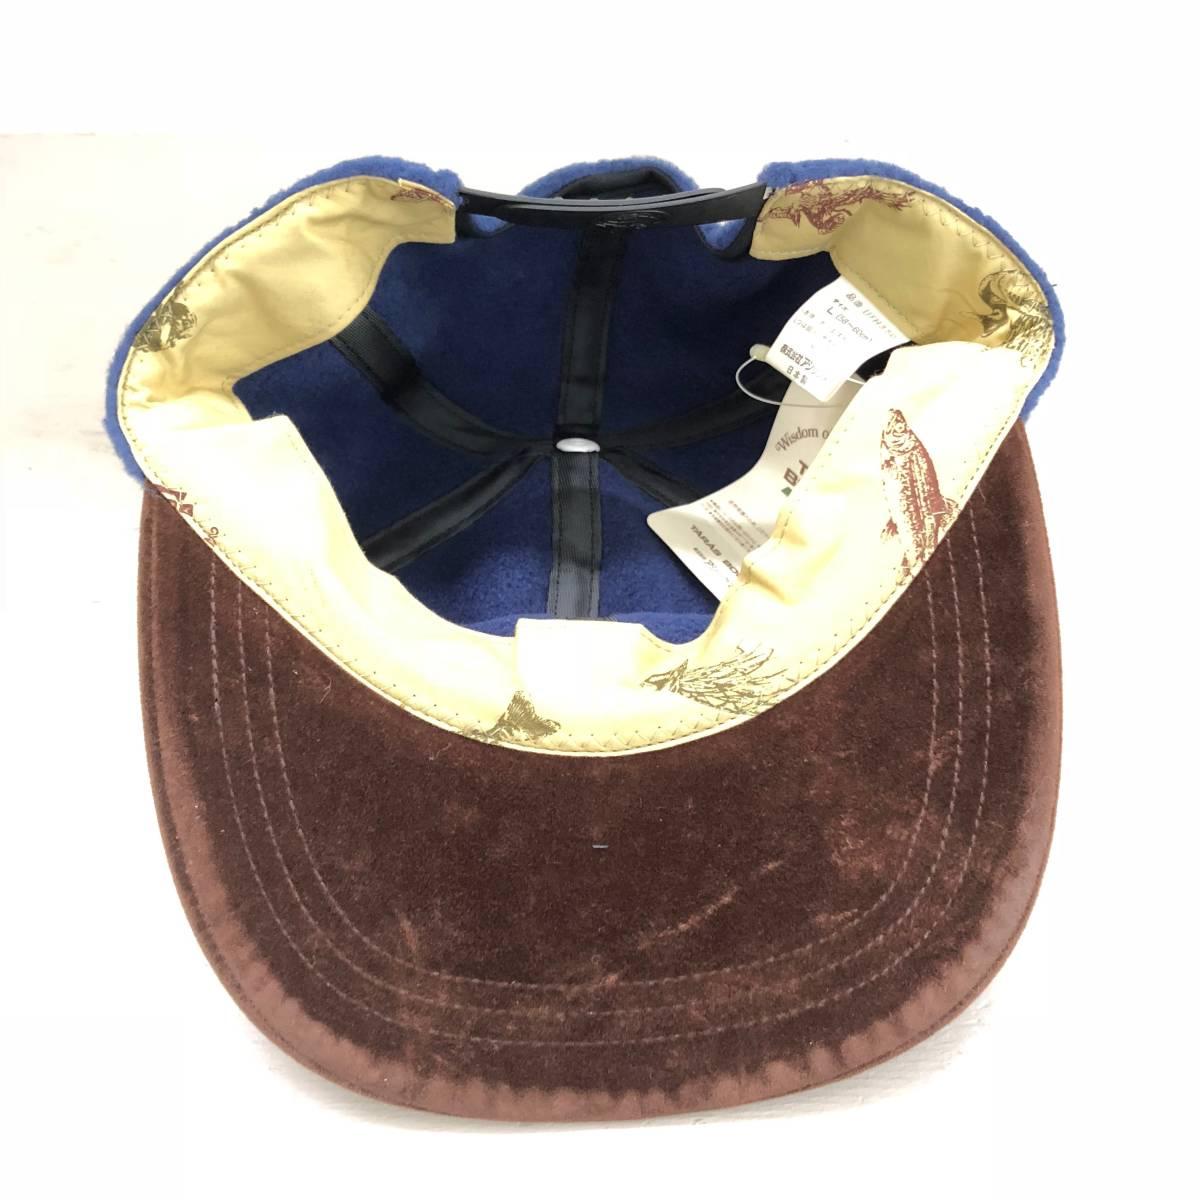 TARAS BOULBA タラスブルバ 帽子 キャップ フリースカントリーキャップ ネイビー 青系 L メンズ アシックス asics UFH350 日本製 未使用_画像4